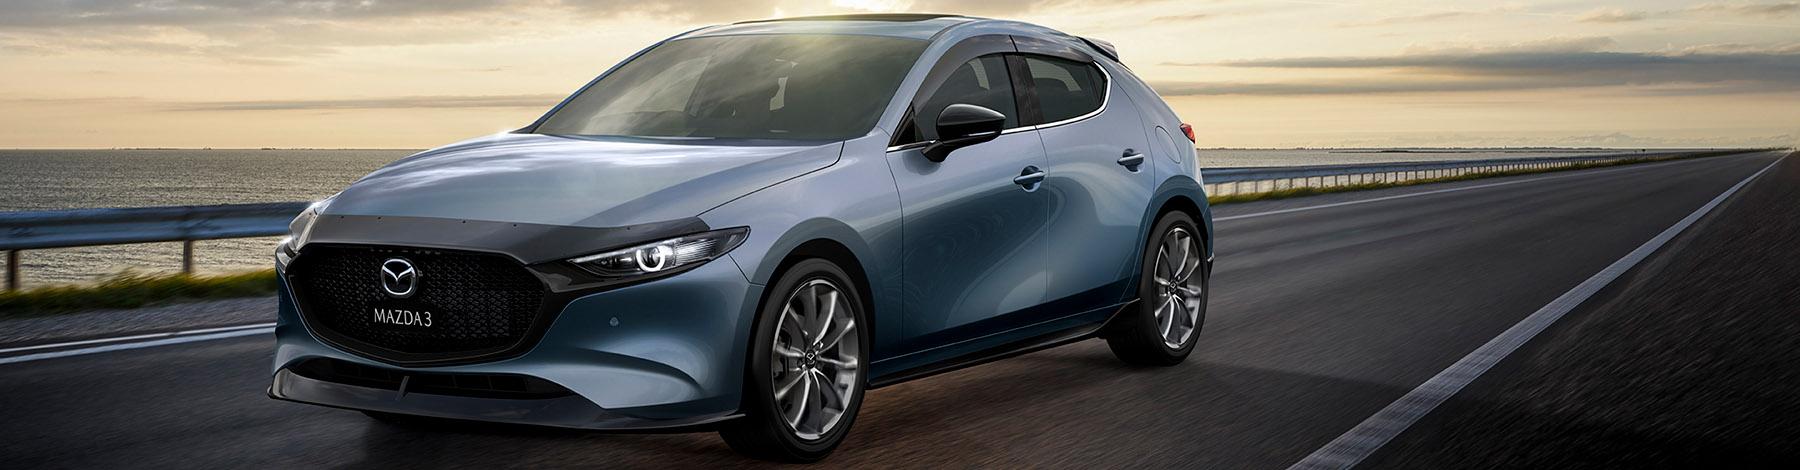 Macarthur Mazda Mazda3 Polymetal Grey Metallic